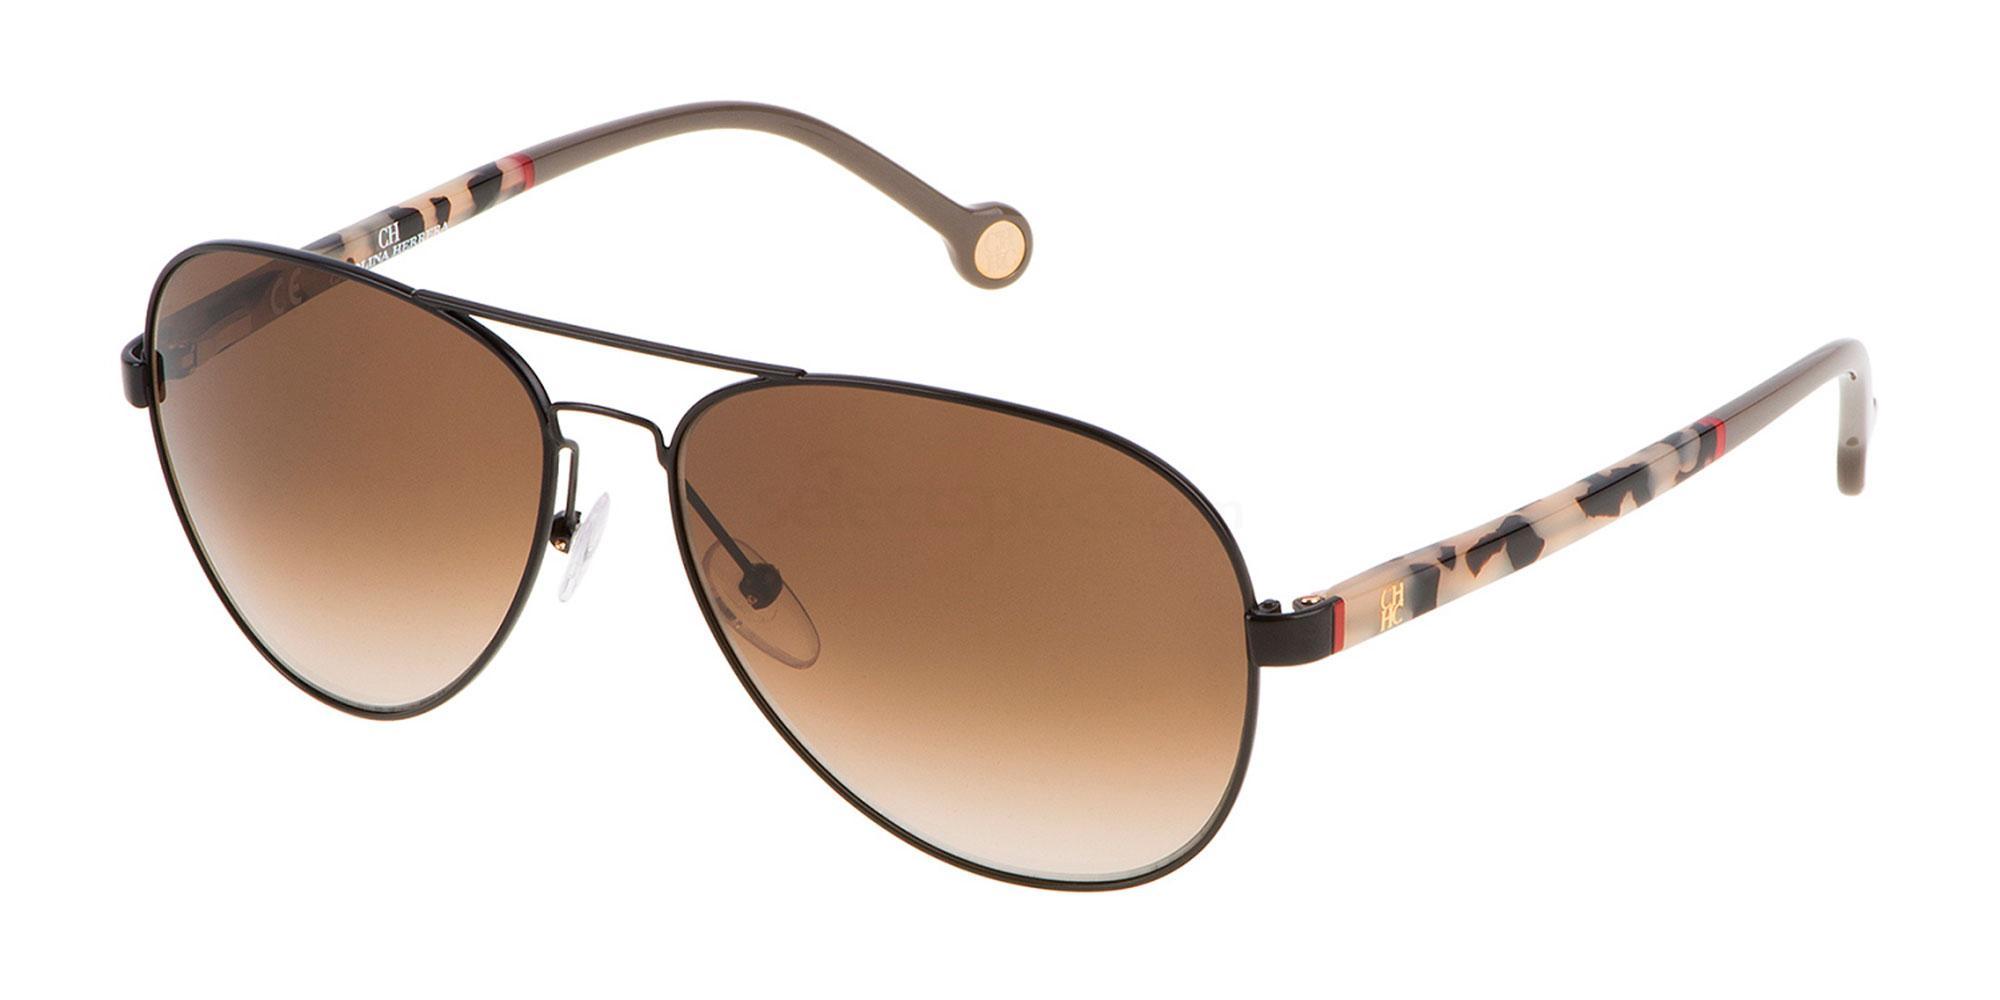 0531 SHE070V Sunglasses, CH Carolina Herrera